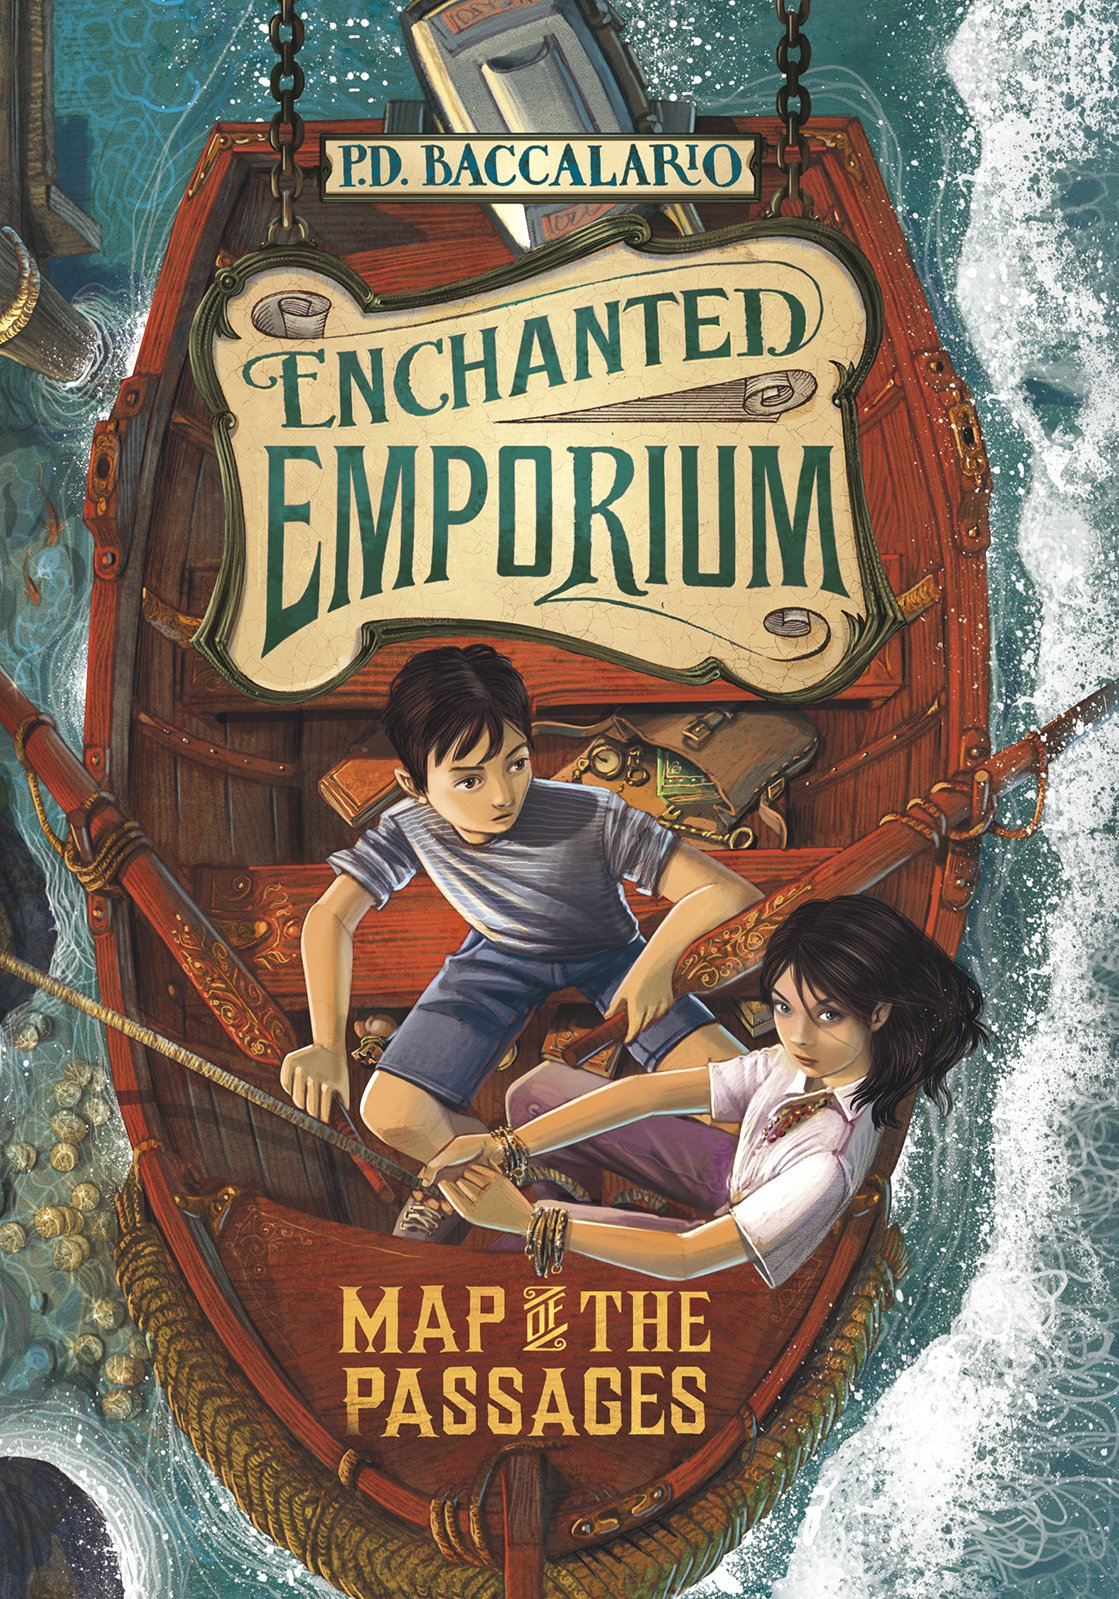 Download Map of the Passages (Enchanted Emporium) PDF